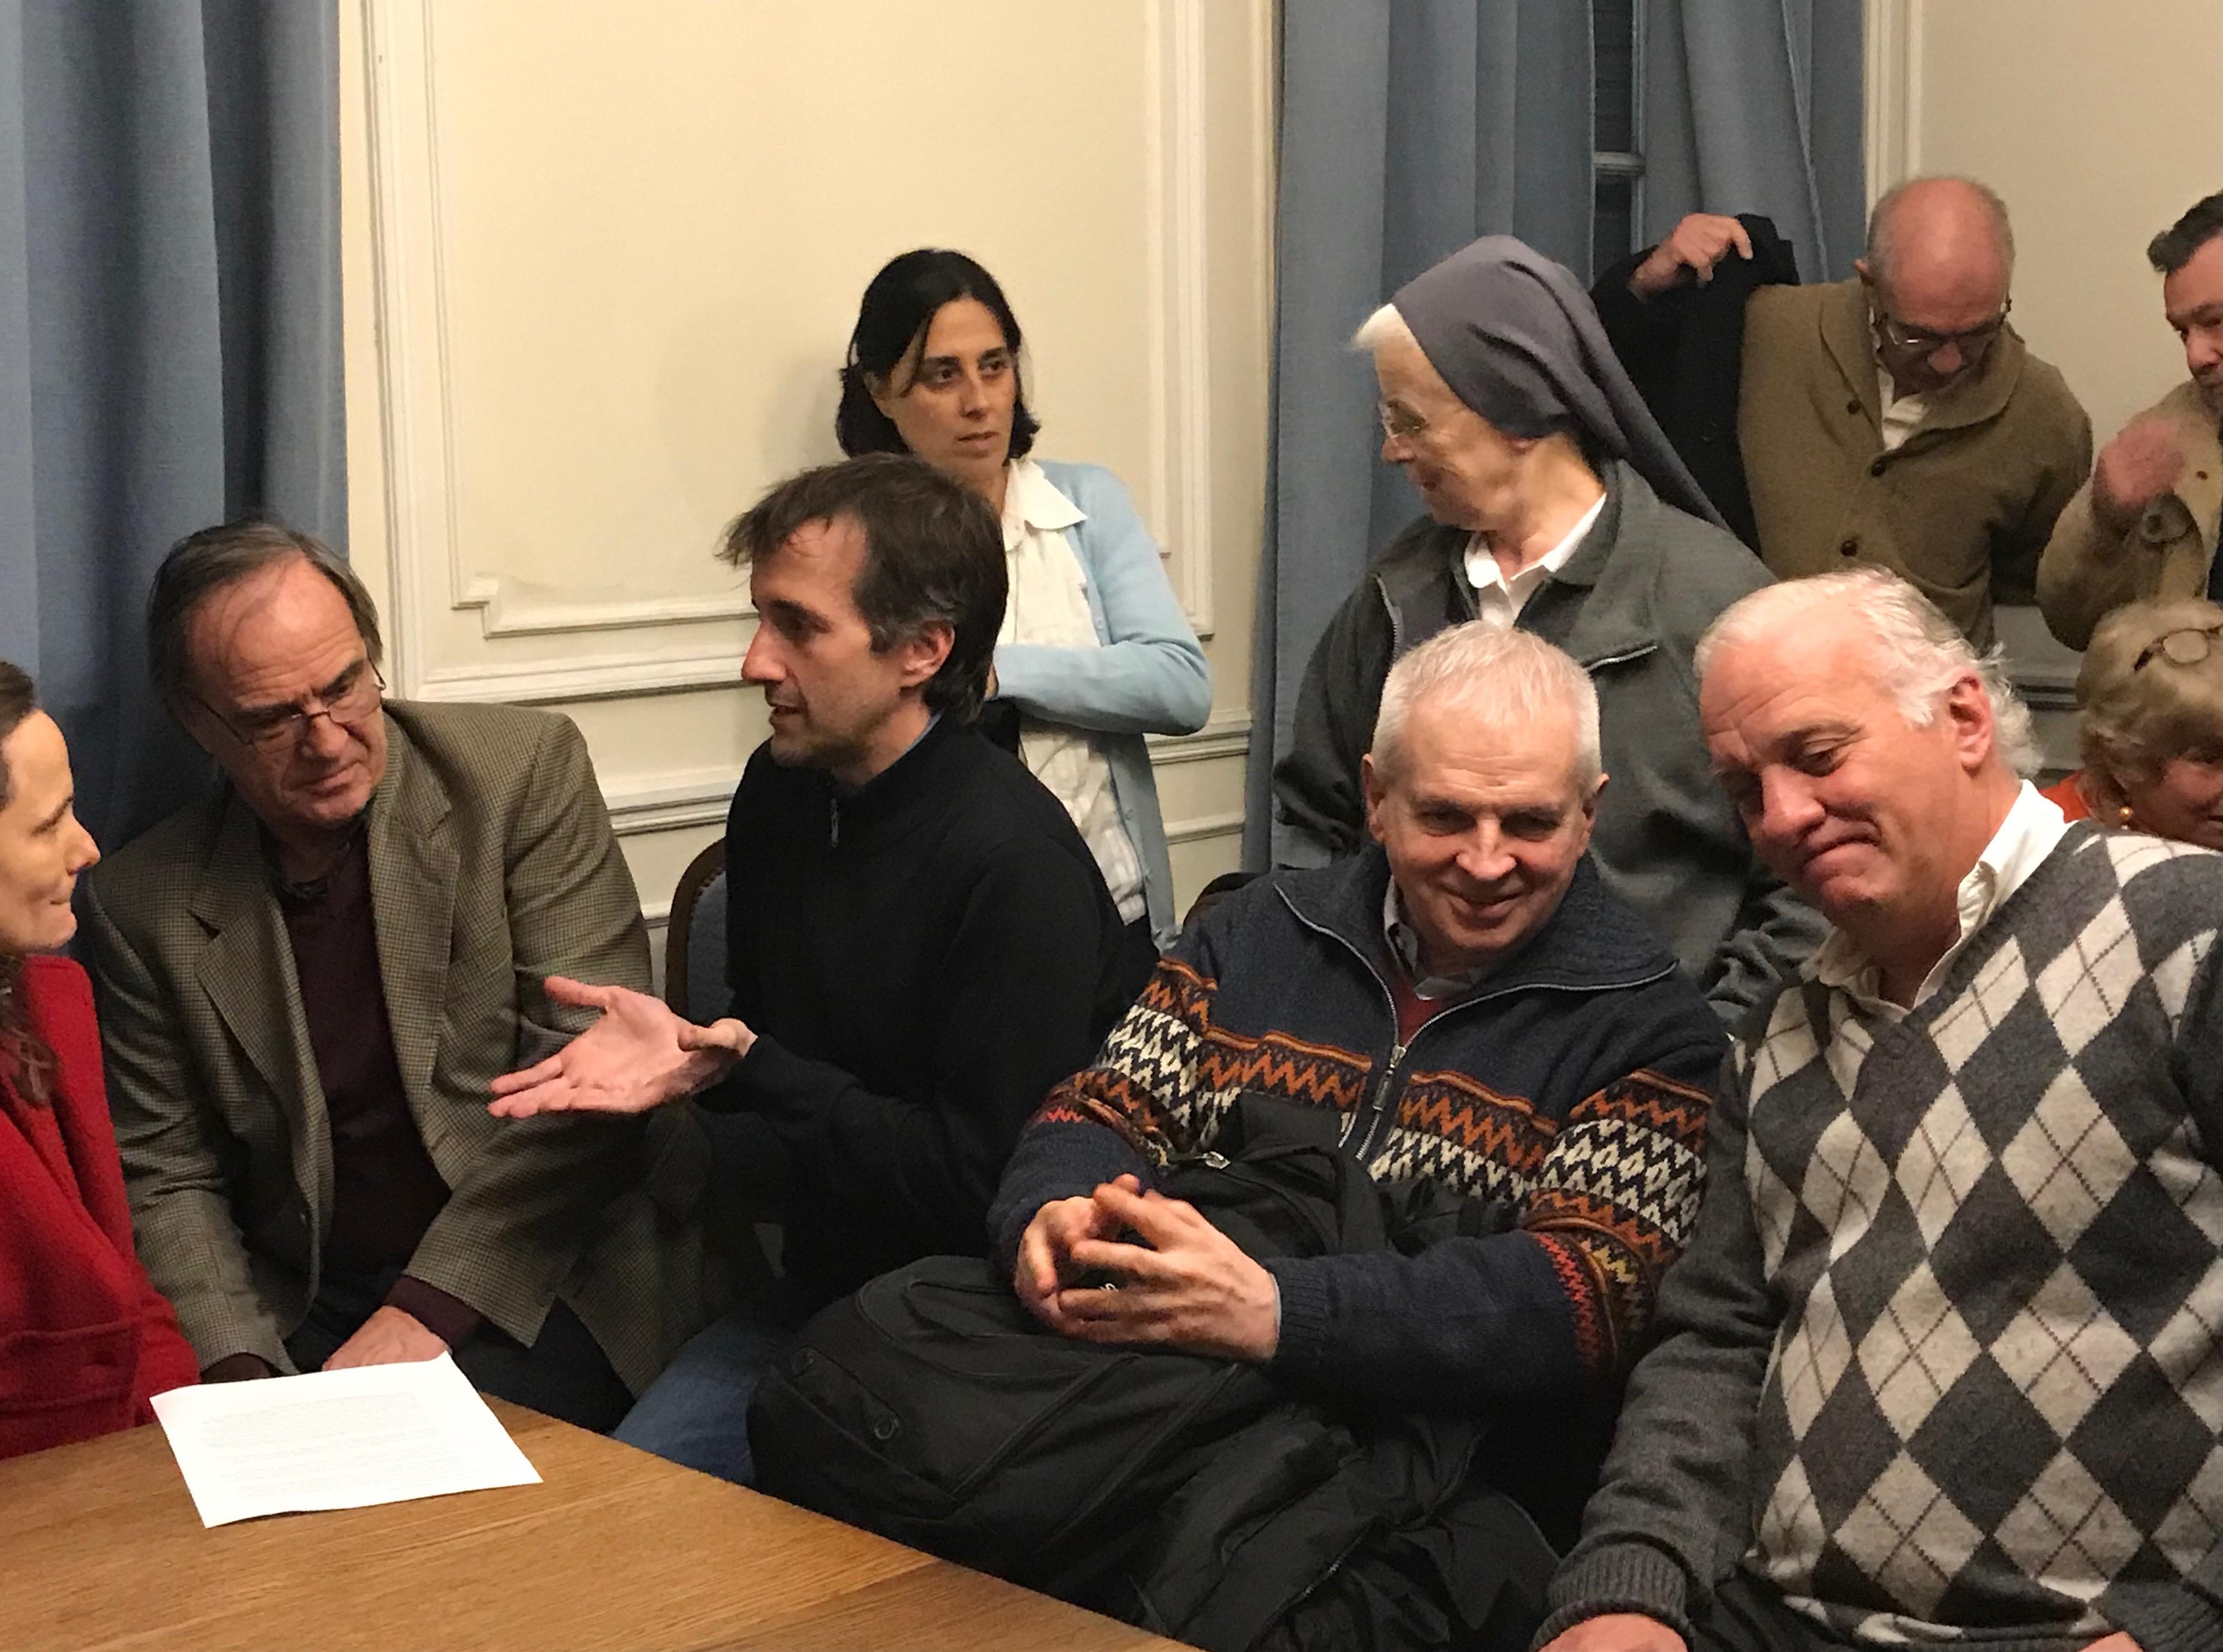 Maria Ana, Francisco, Alberto, Jorge